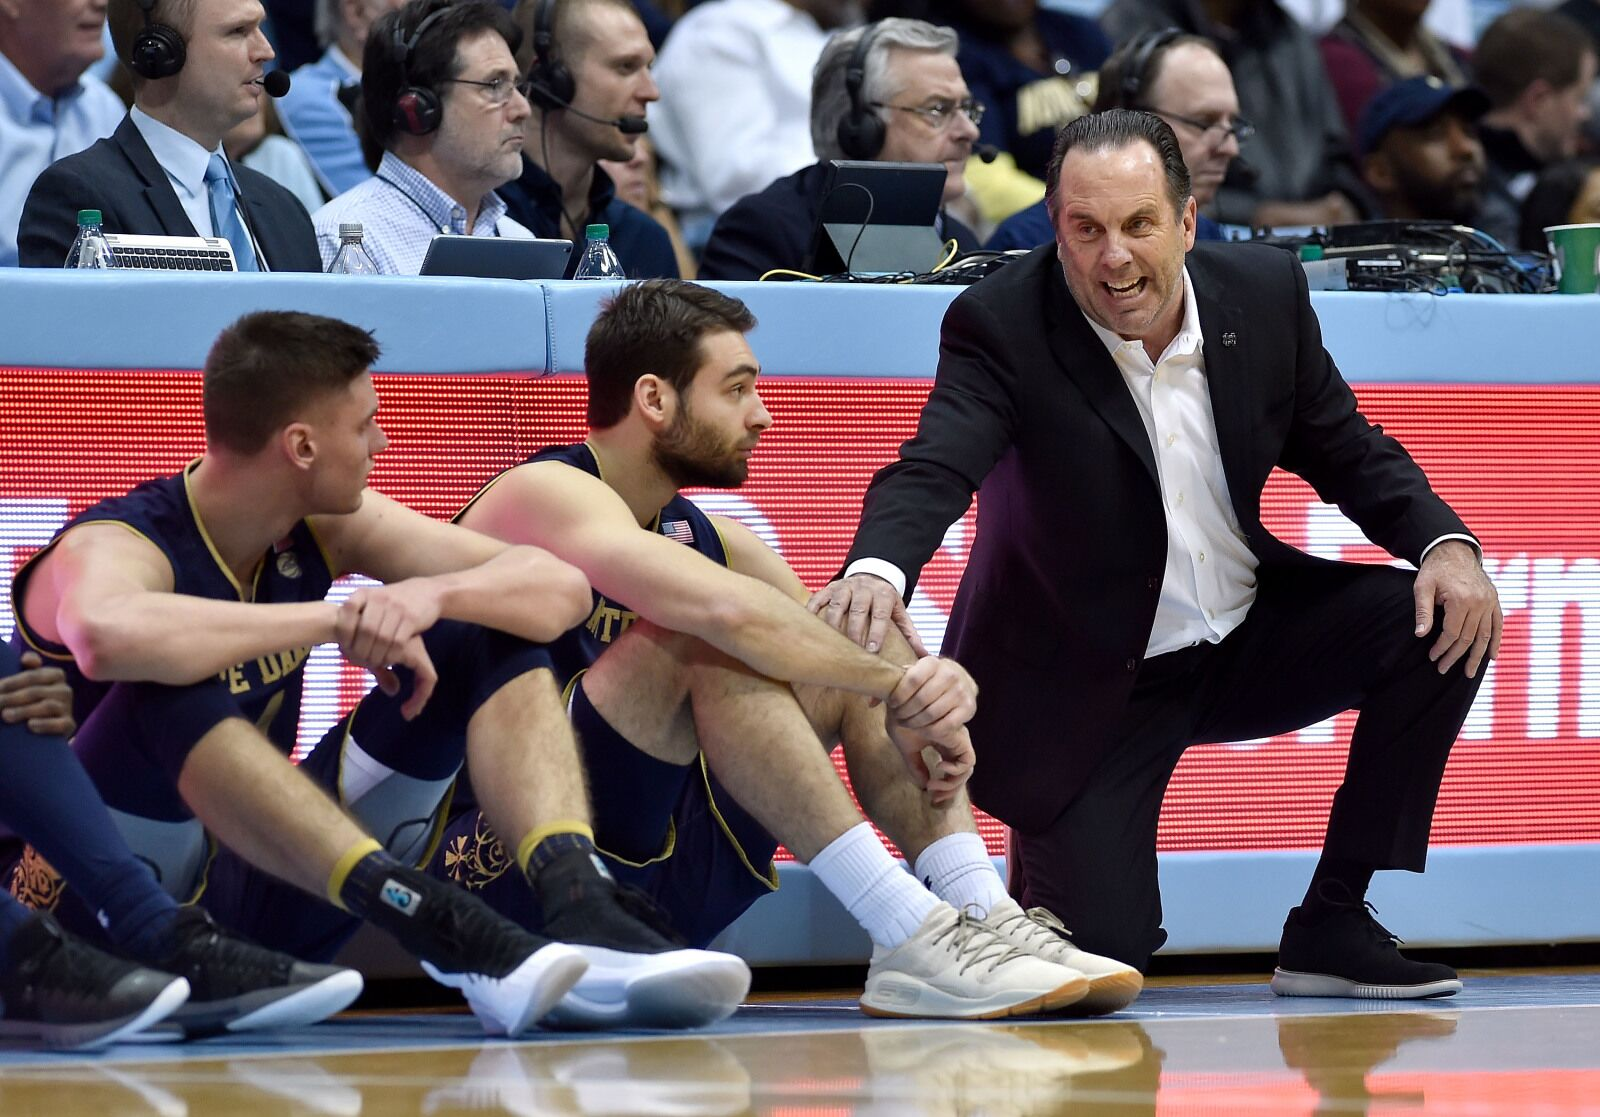 Notre Dame Basketball: Irish Hope to Take Advantage of Reeling Wolfpack